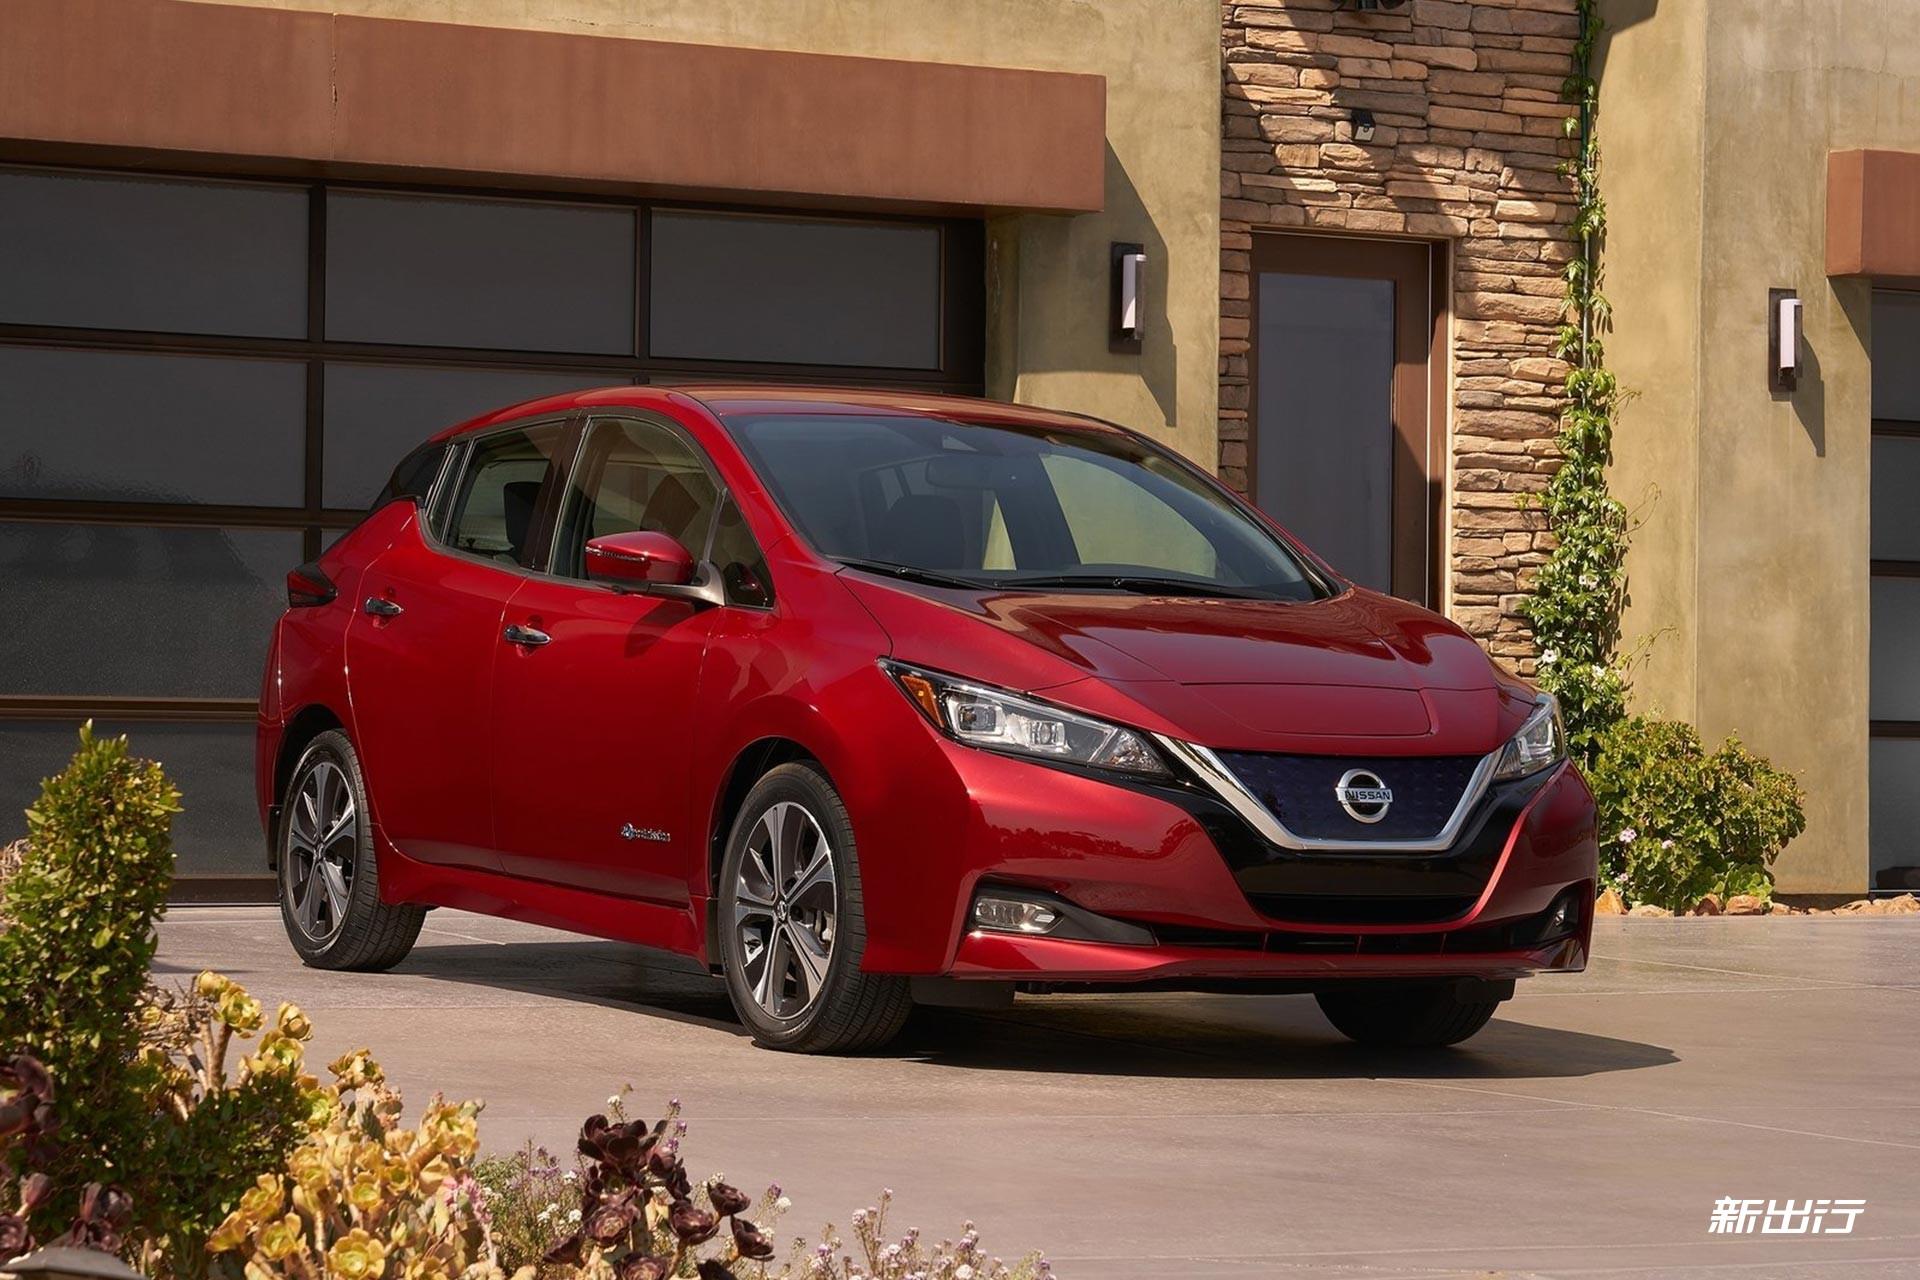 Nissan-Leaf-2018-1600-05.jpg